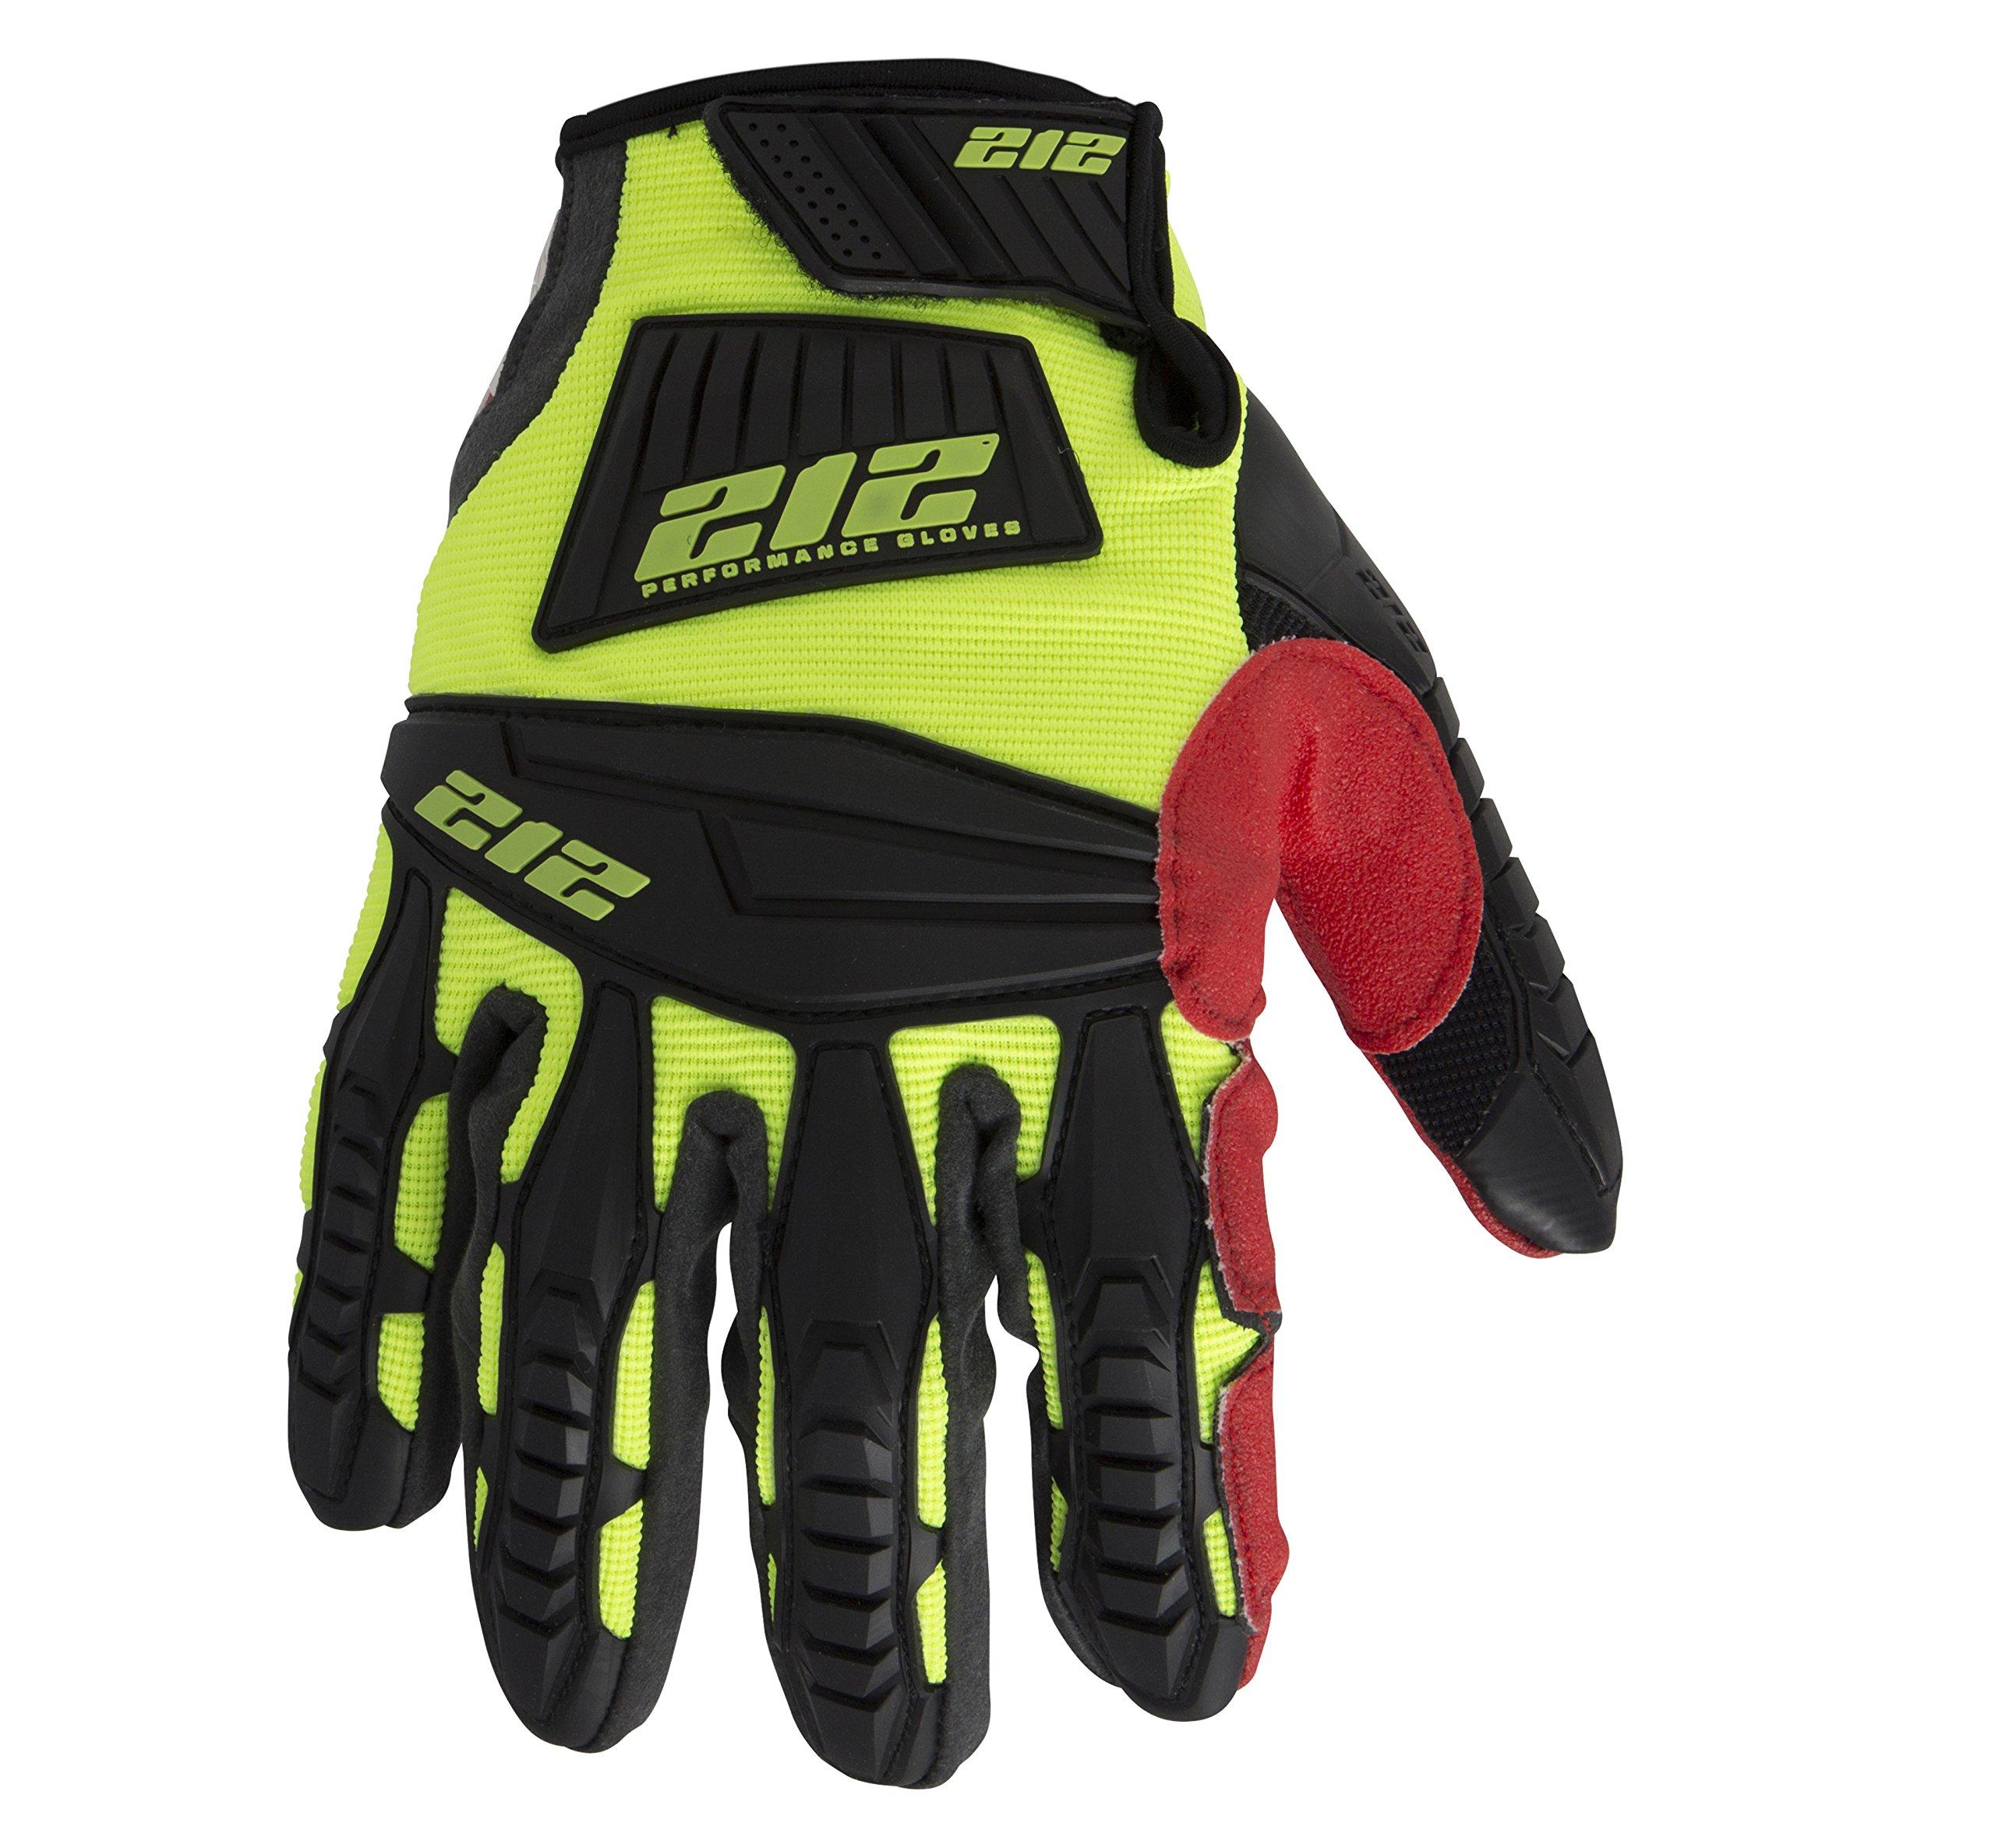 212 Performance Gloves IMP-88-009 Super Hi-Vis Impact Gloves, Medium by 212 Performance Gloves (Image #3)